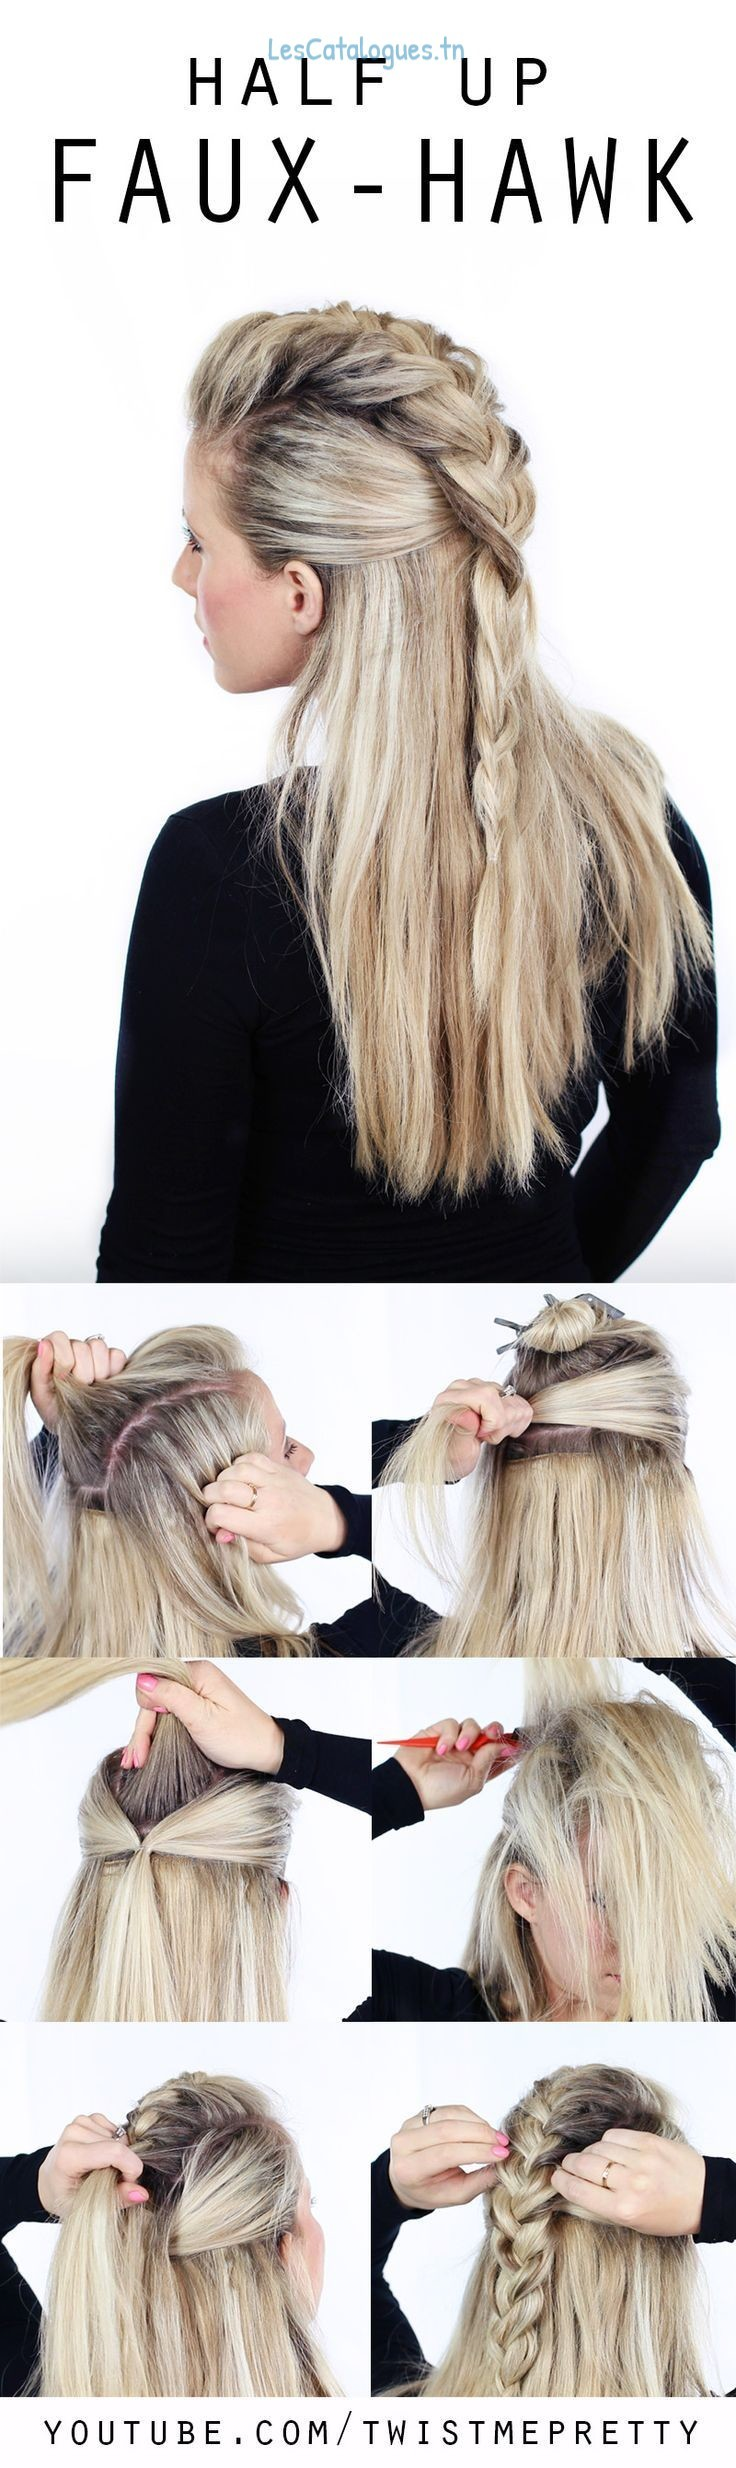 coiffure-cheveux-25